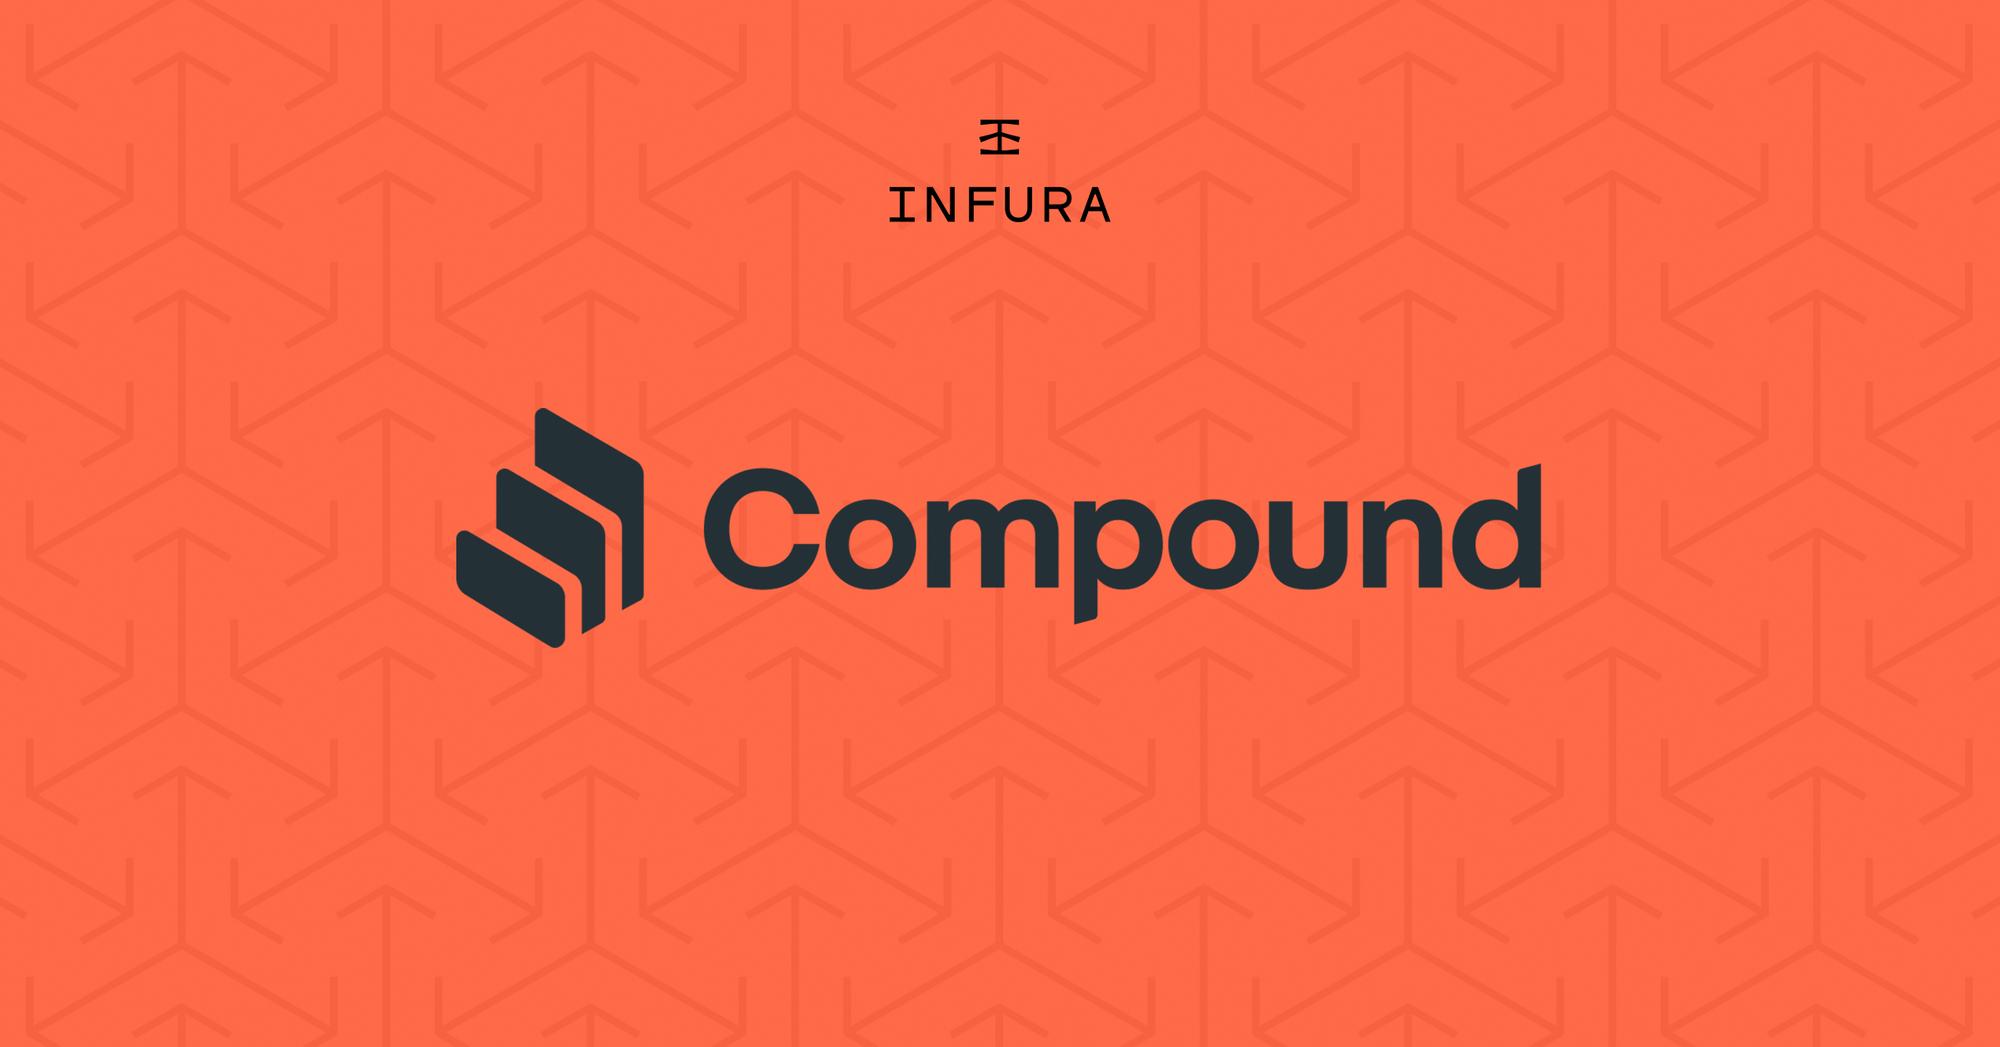 How the Compound Team Optimizes Infura Usage to Power Their DeFi Protocol